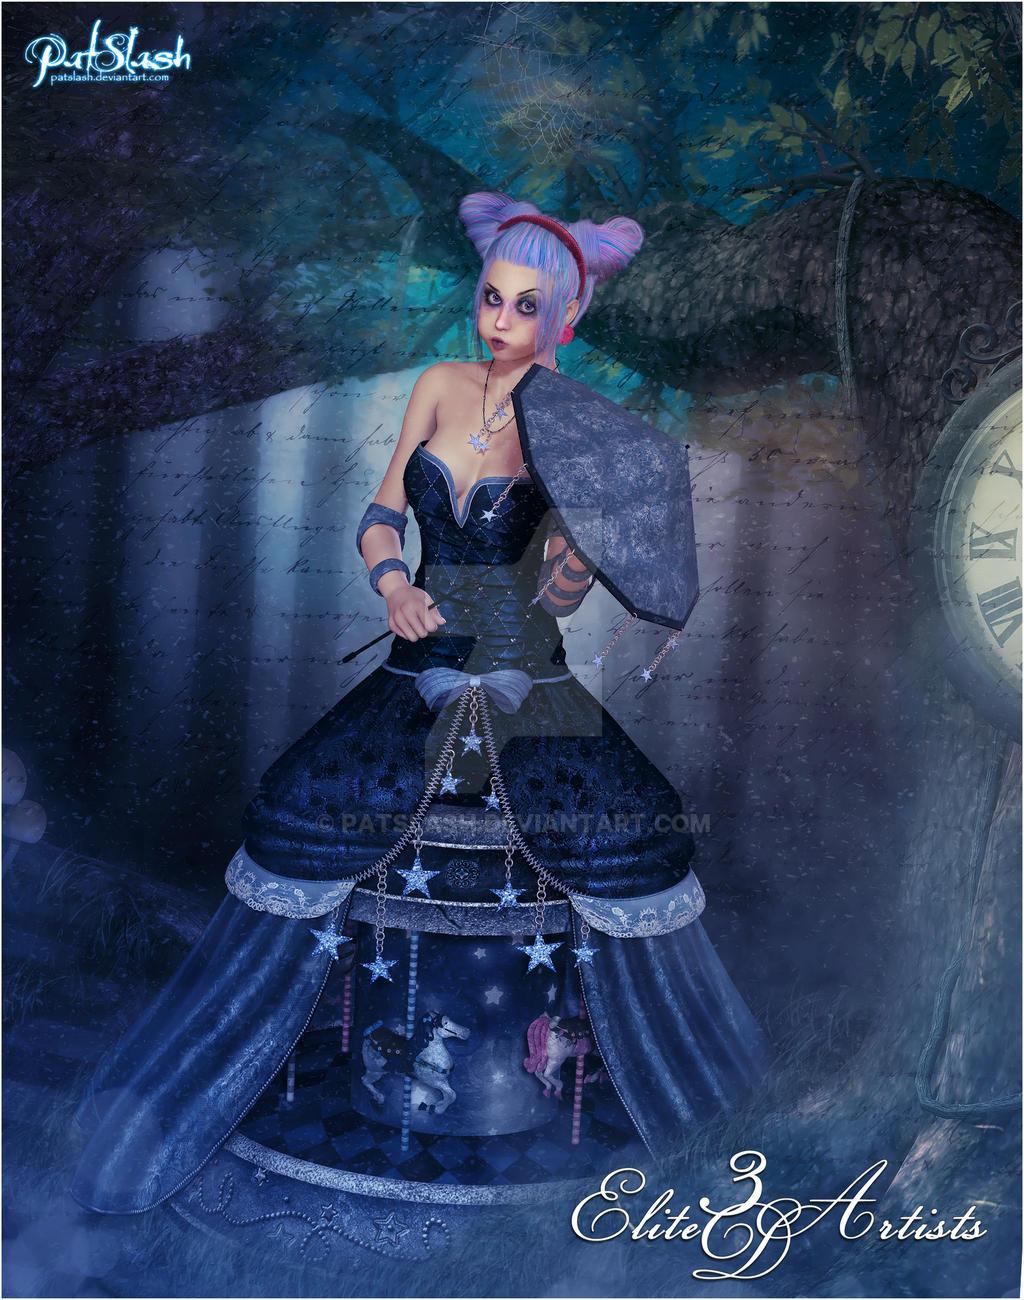 Twistedtales by patslash on deviantart for Surreal salon 8